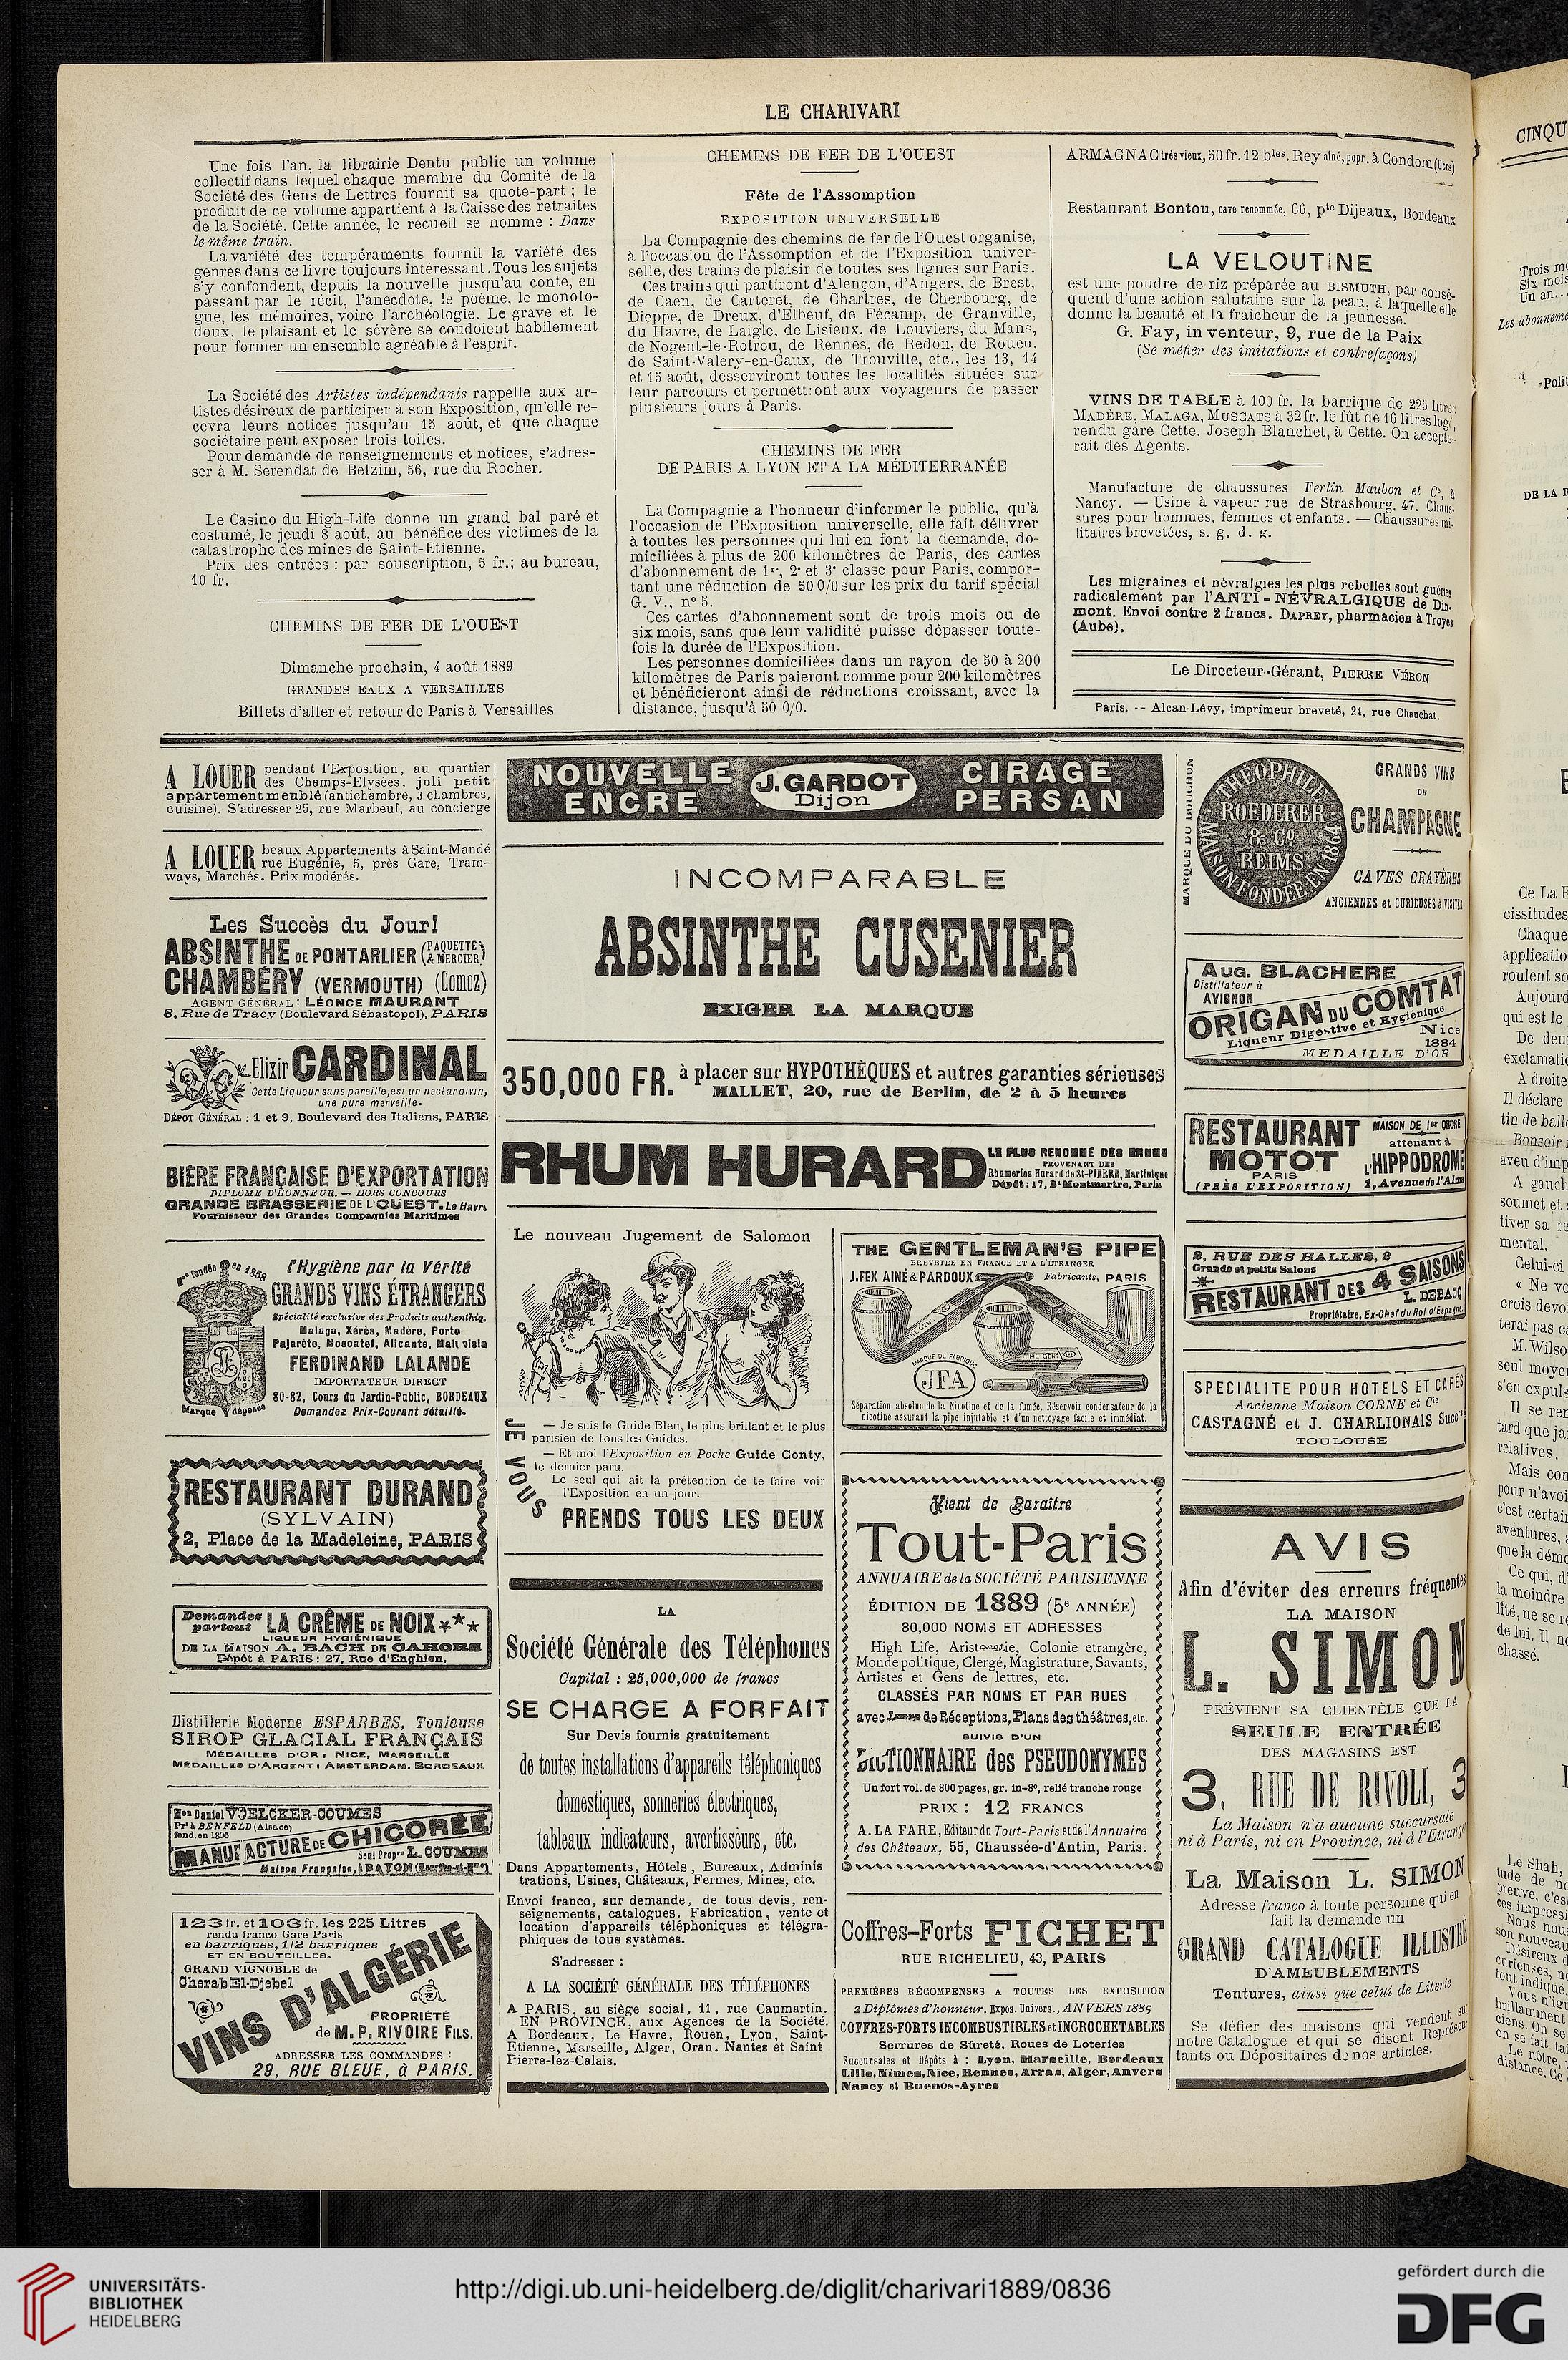 Le charivari (58.1889)